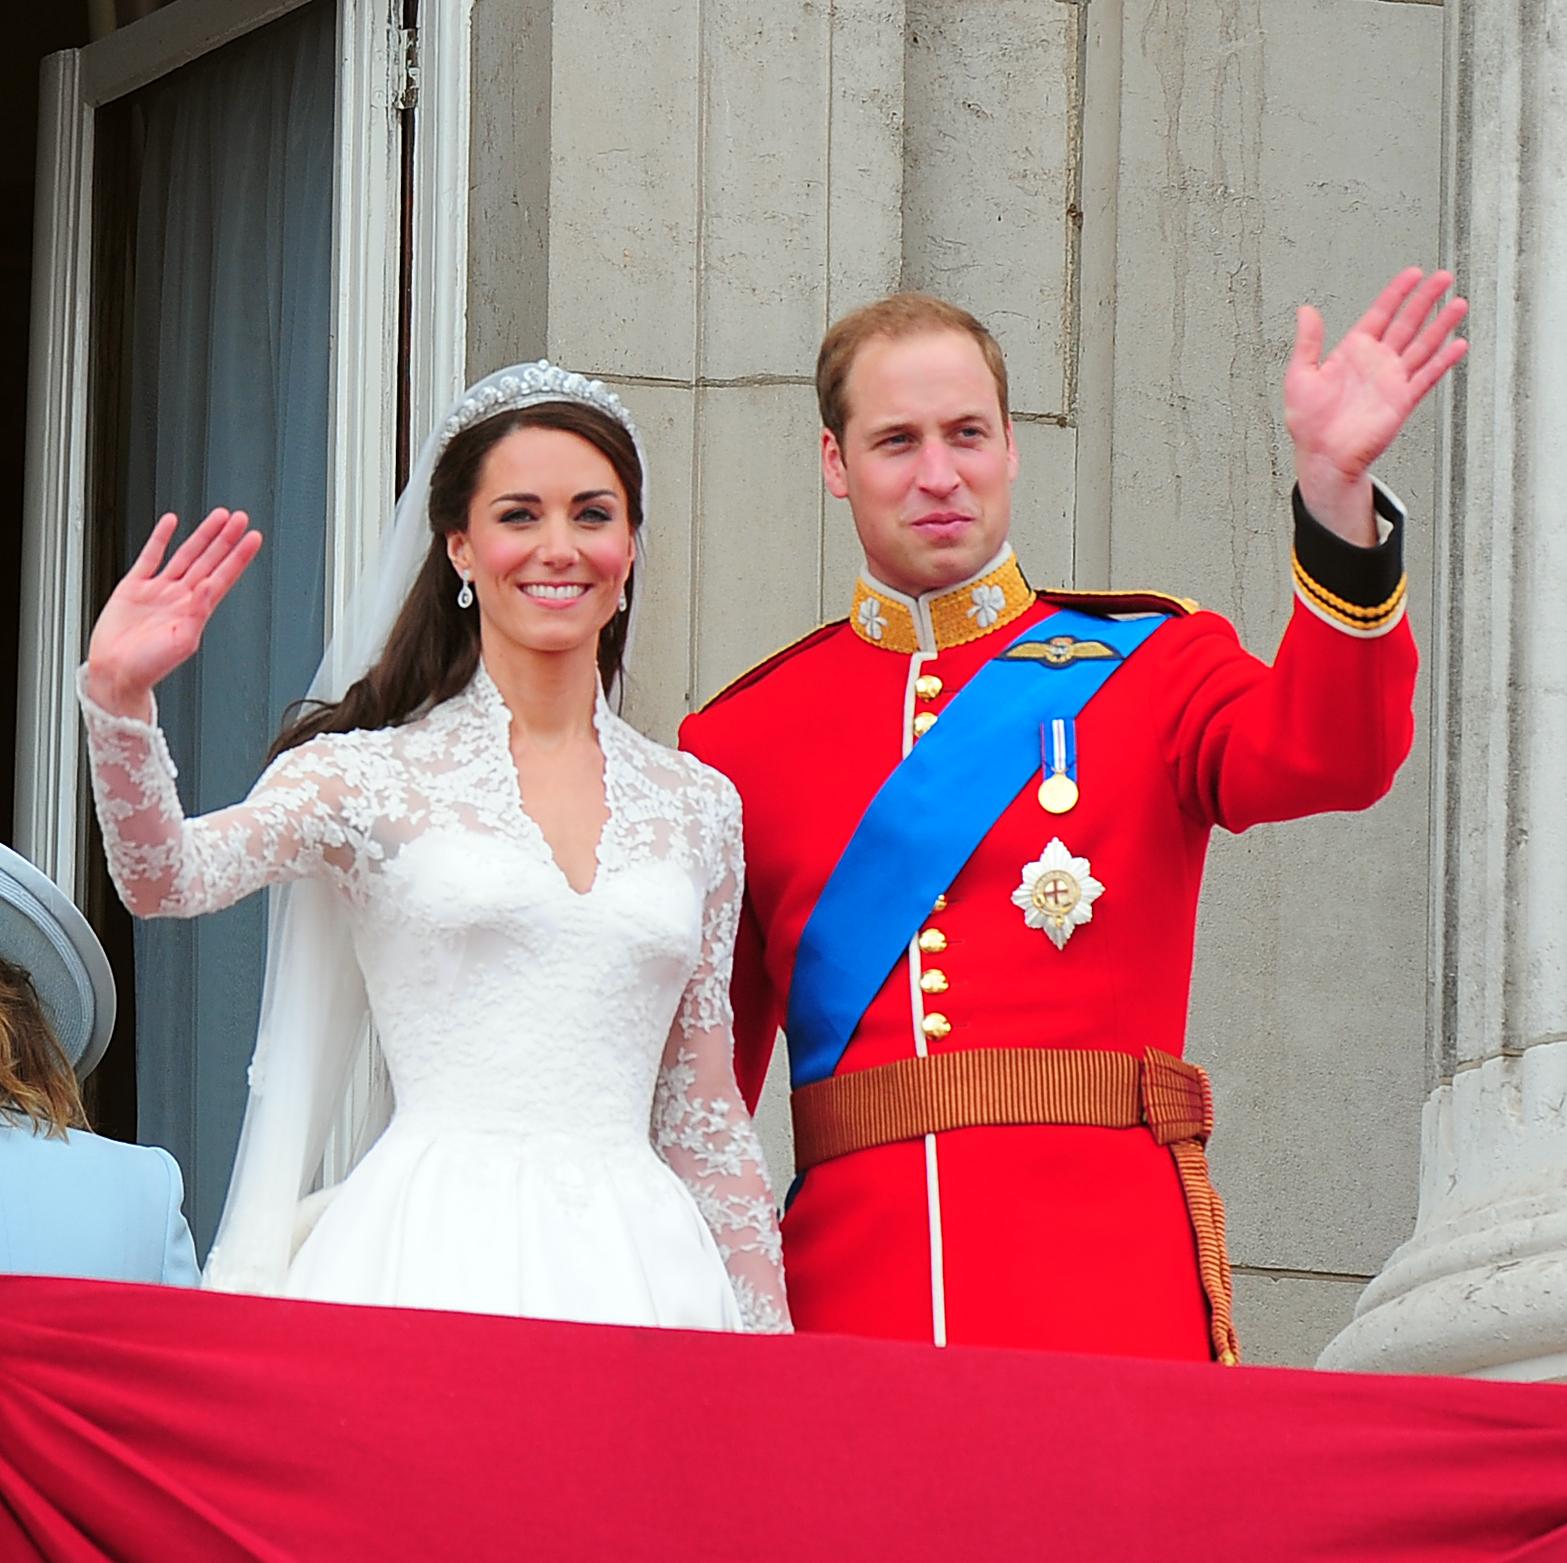 Prince William Kate Middleton Royal Wedding Balcony